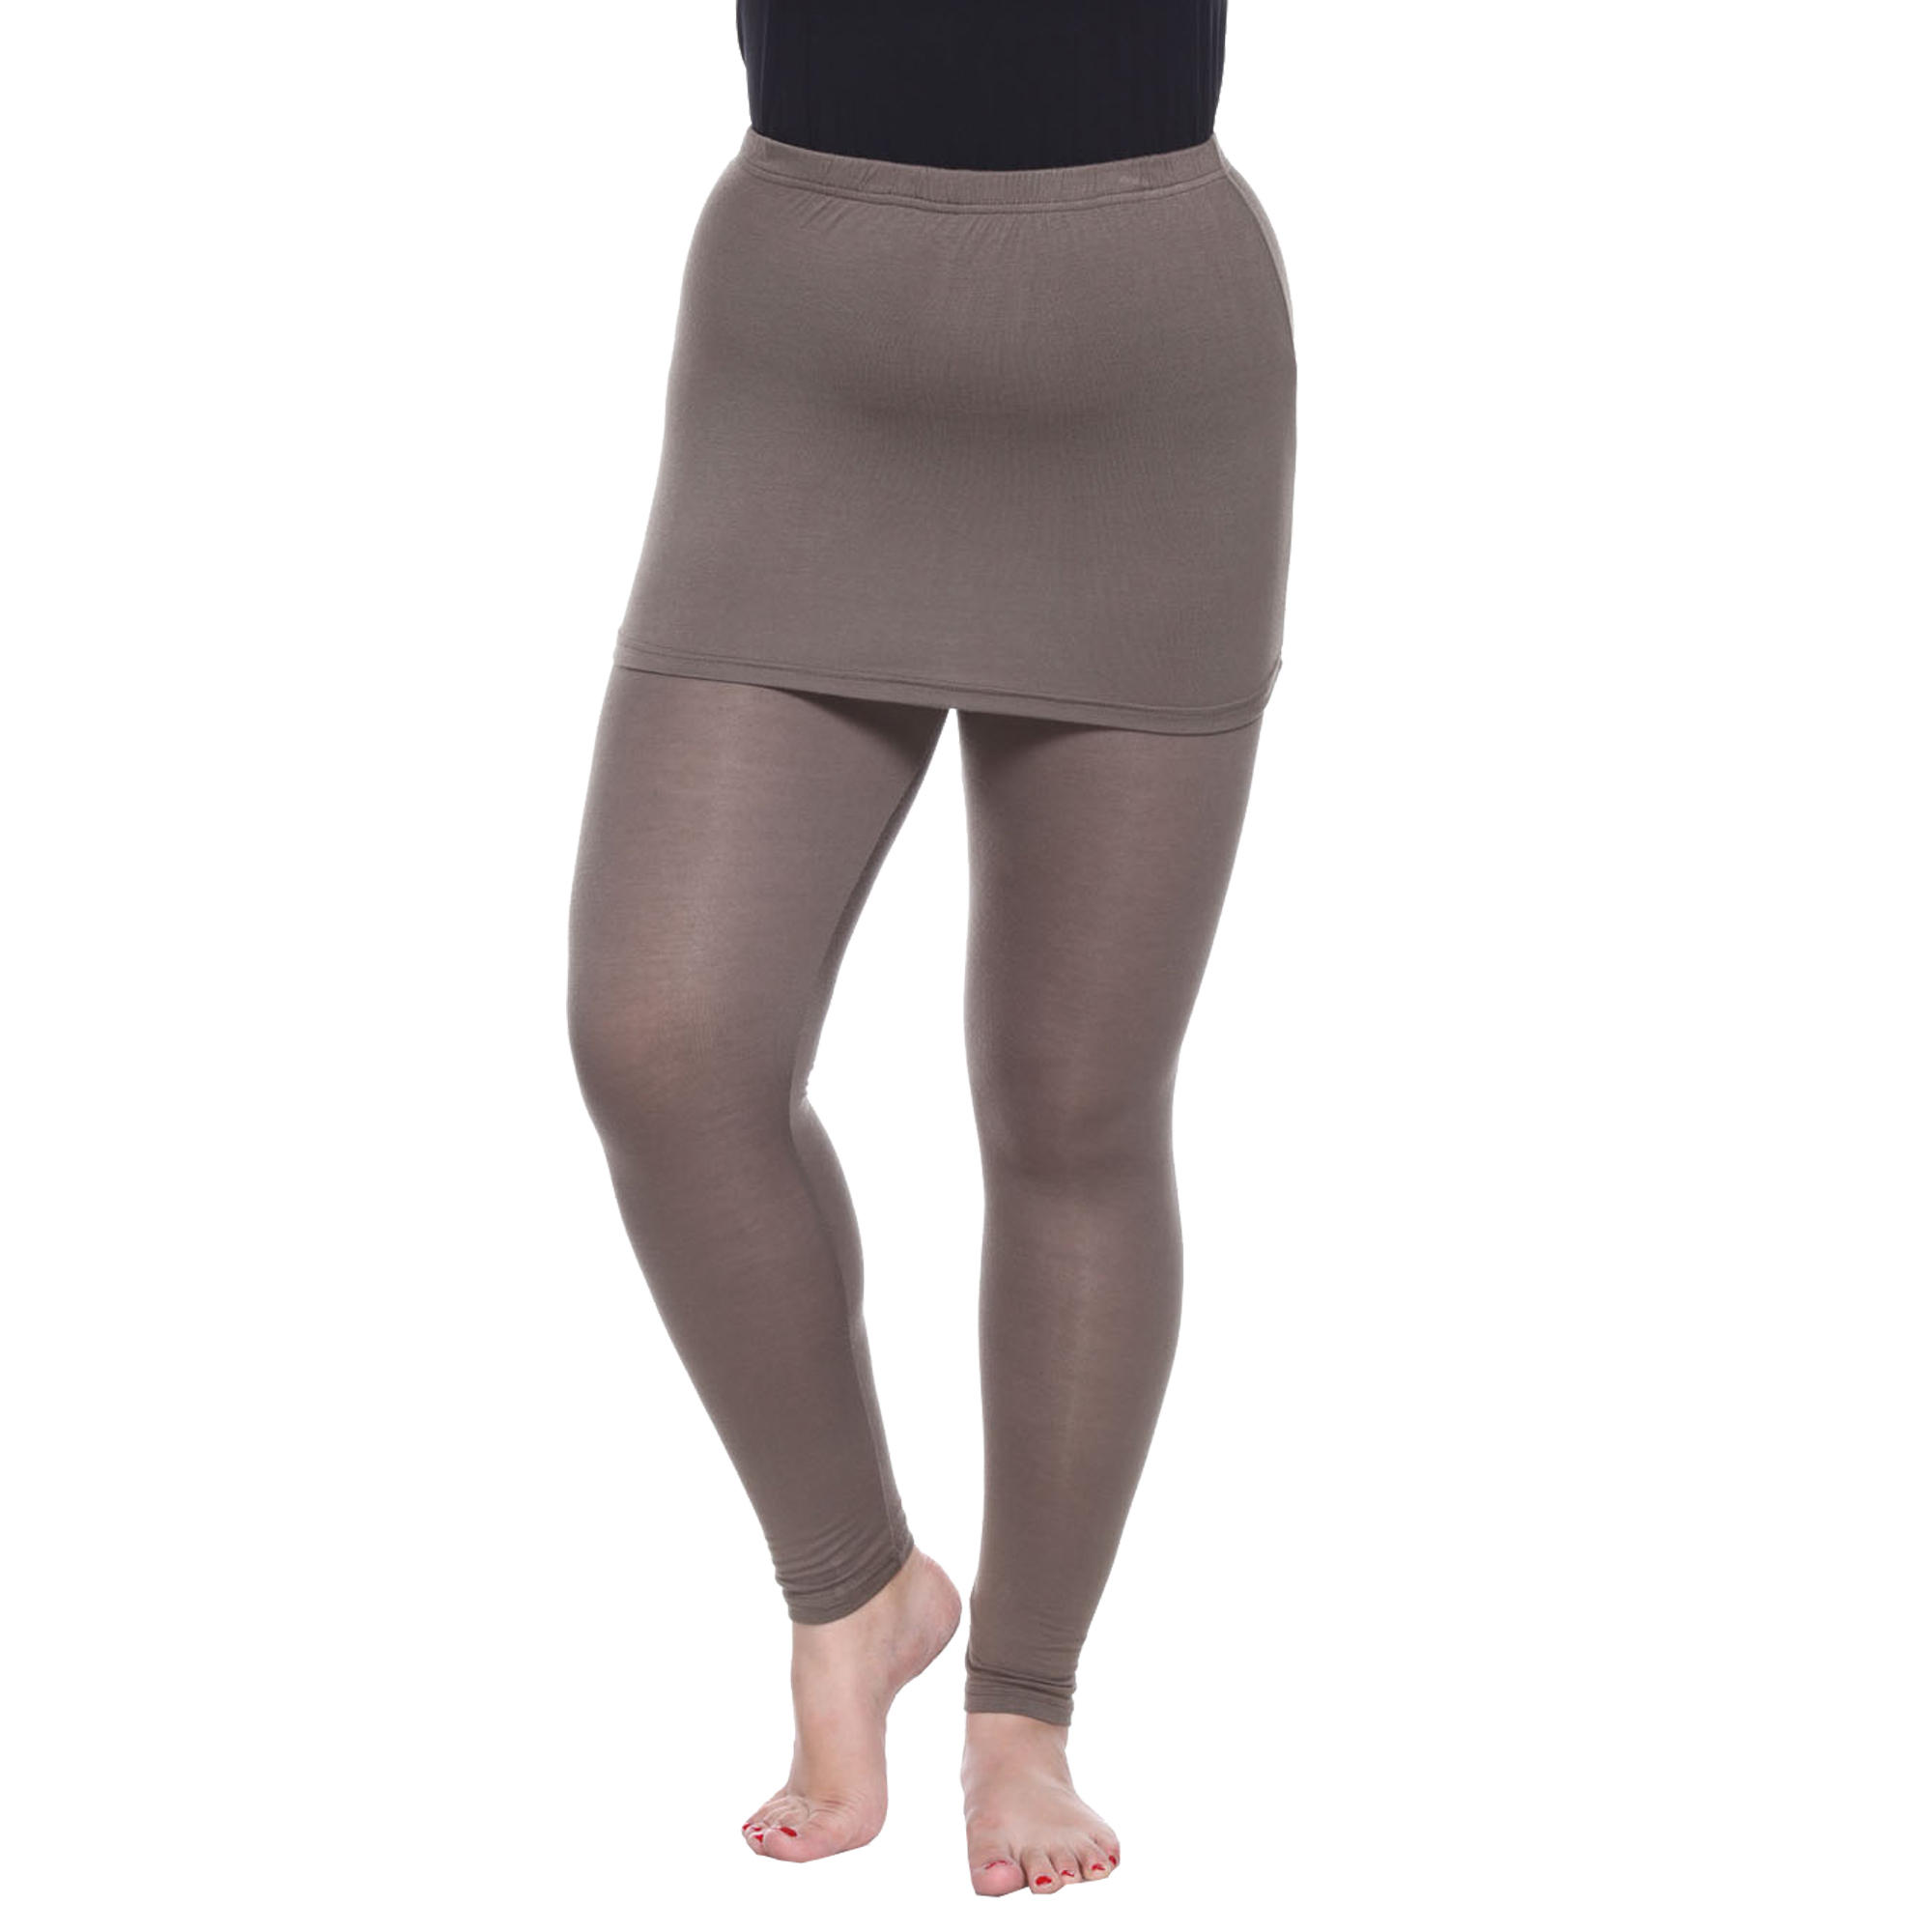 Plus Size Skirted Leggings - Olive